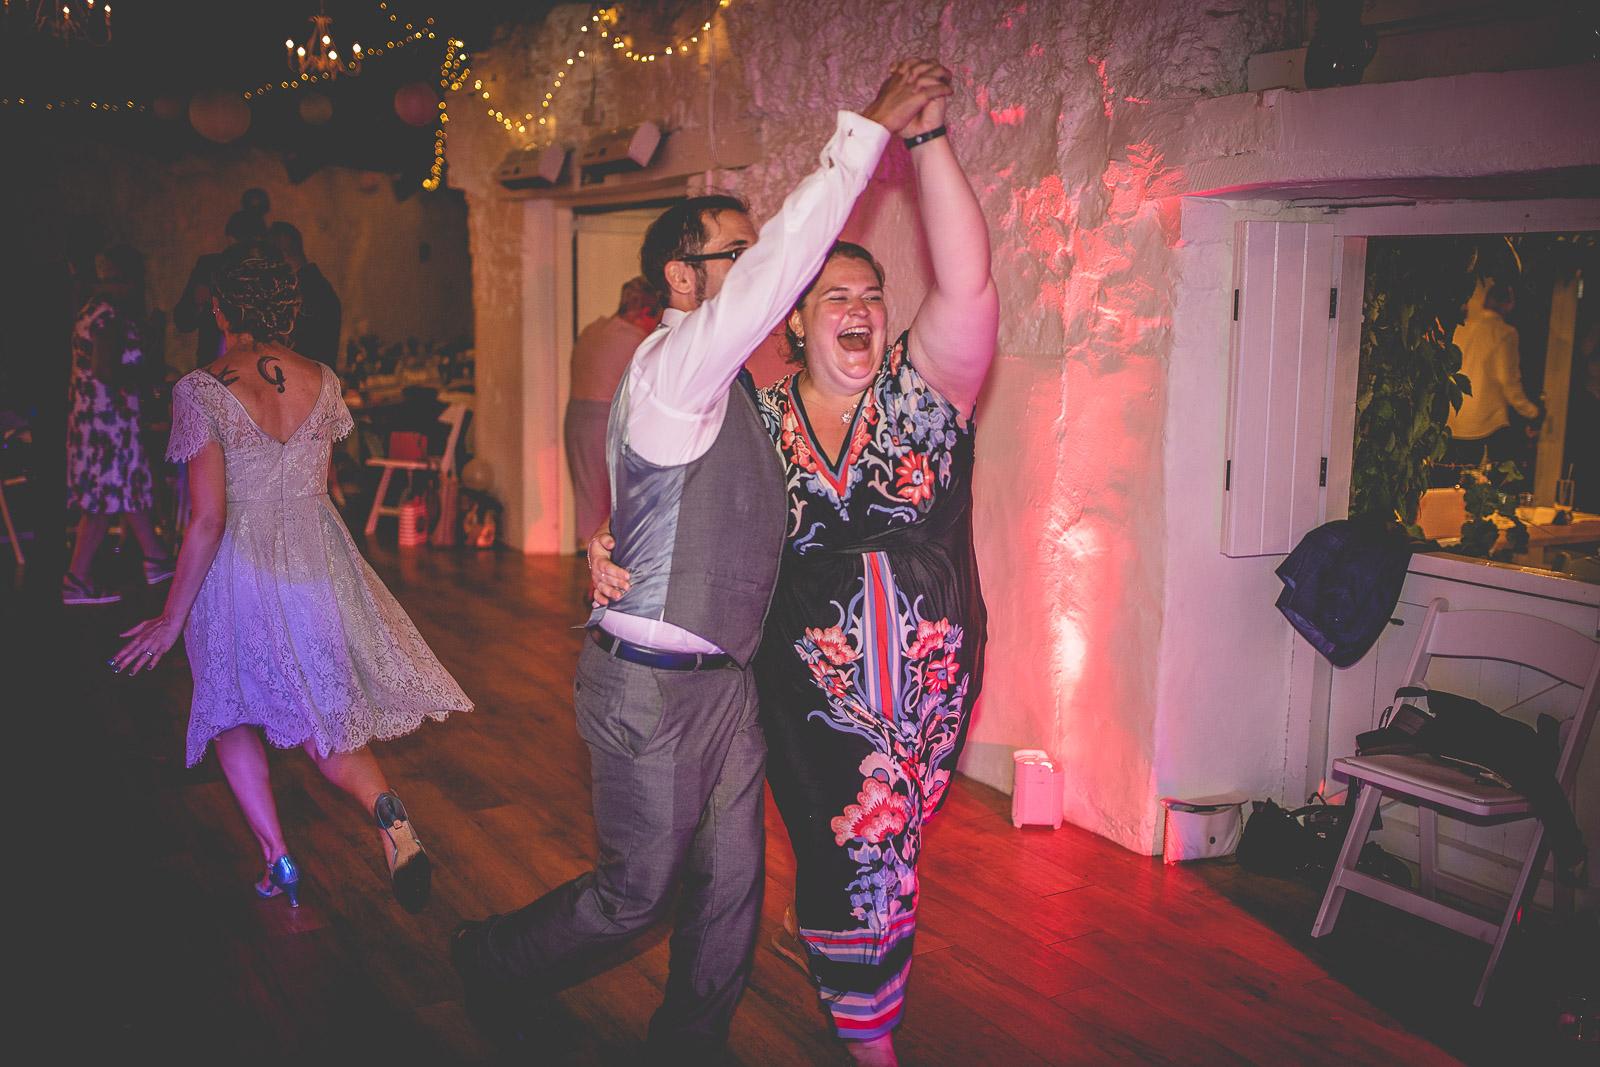 the old barn - clovelly - ugotthelove - wedding photography-9212.jpg